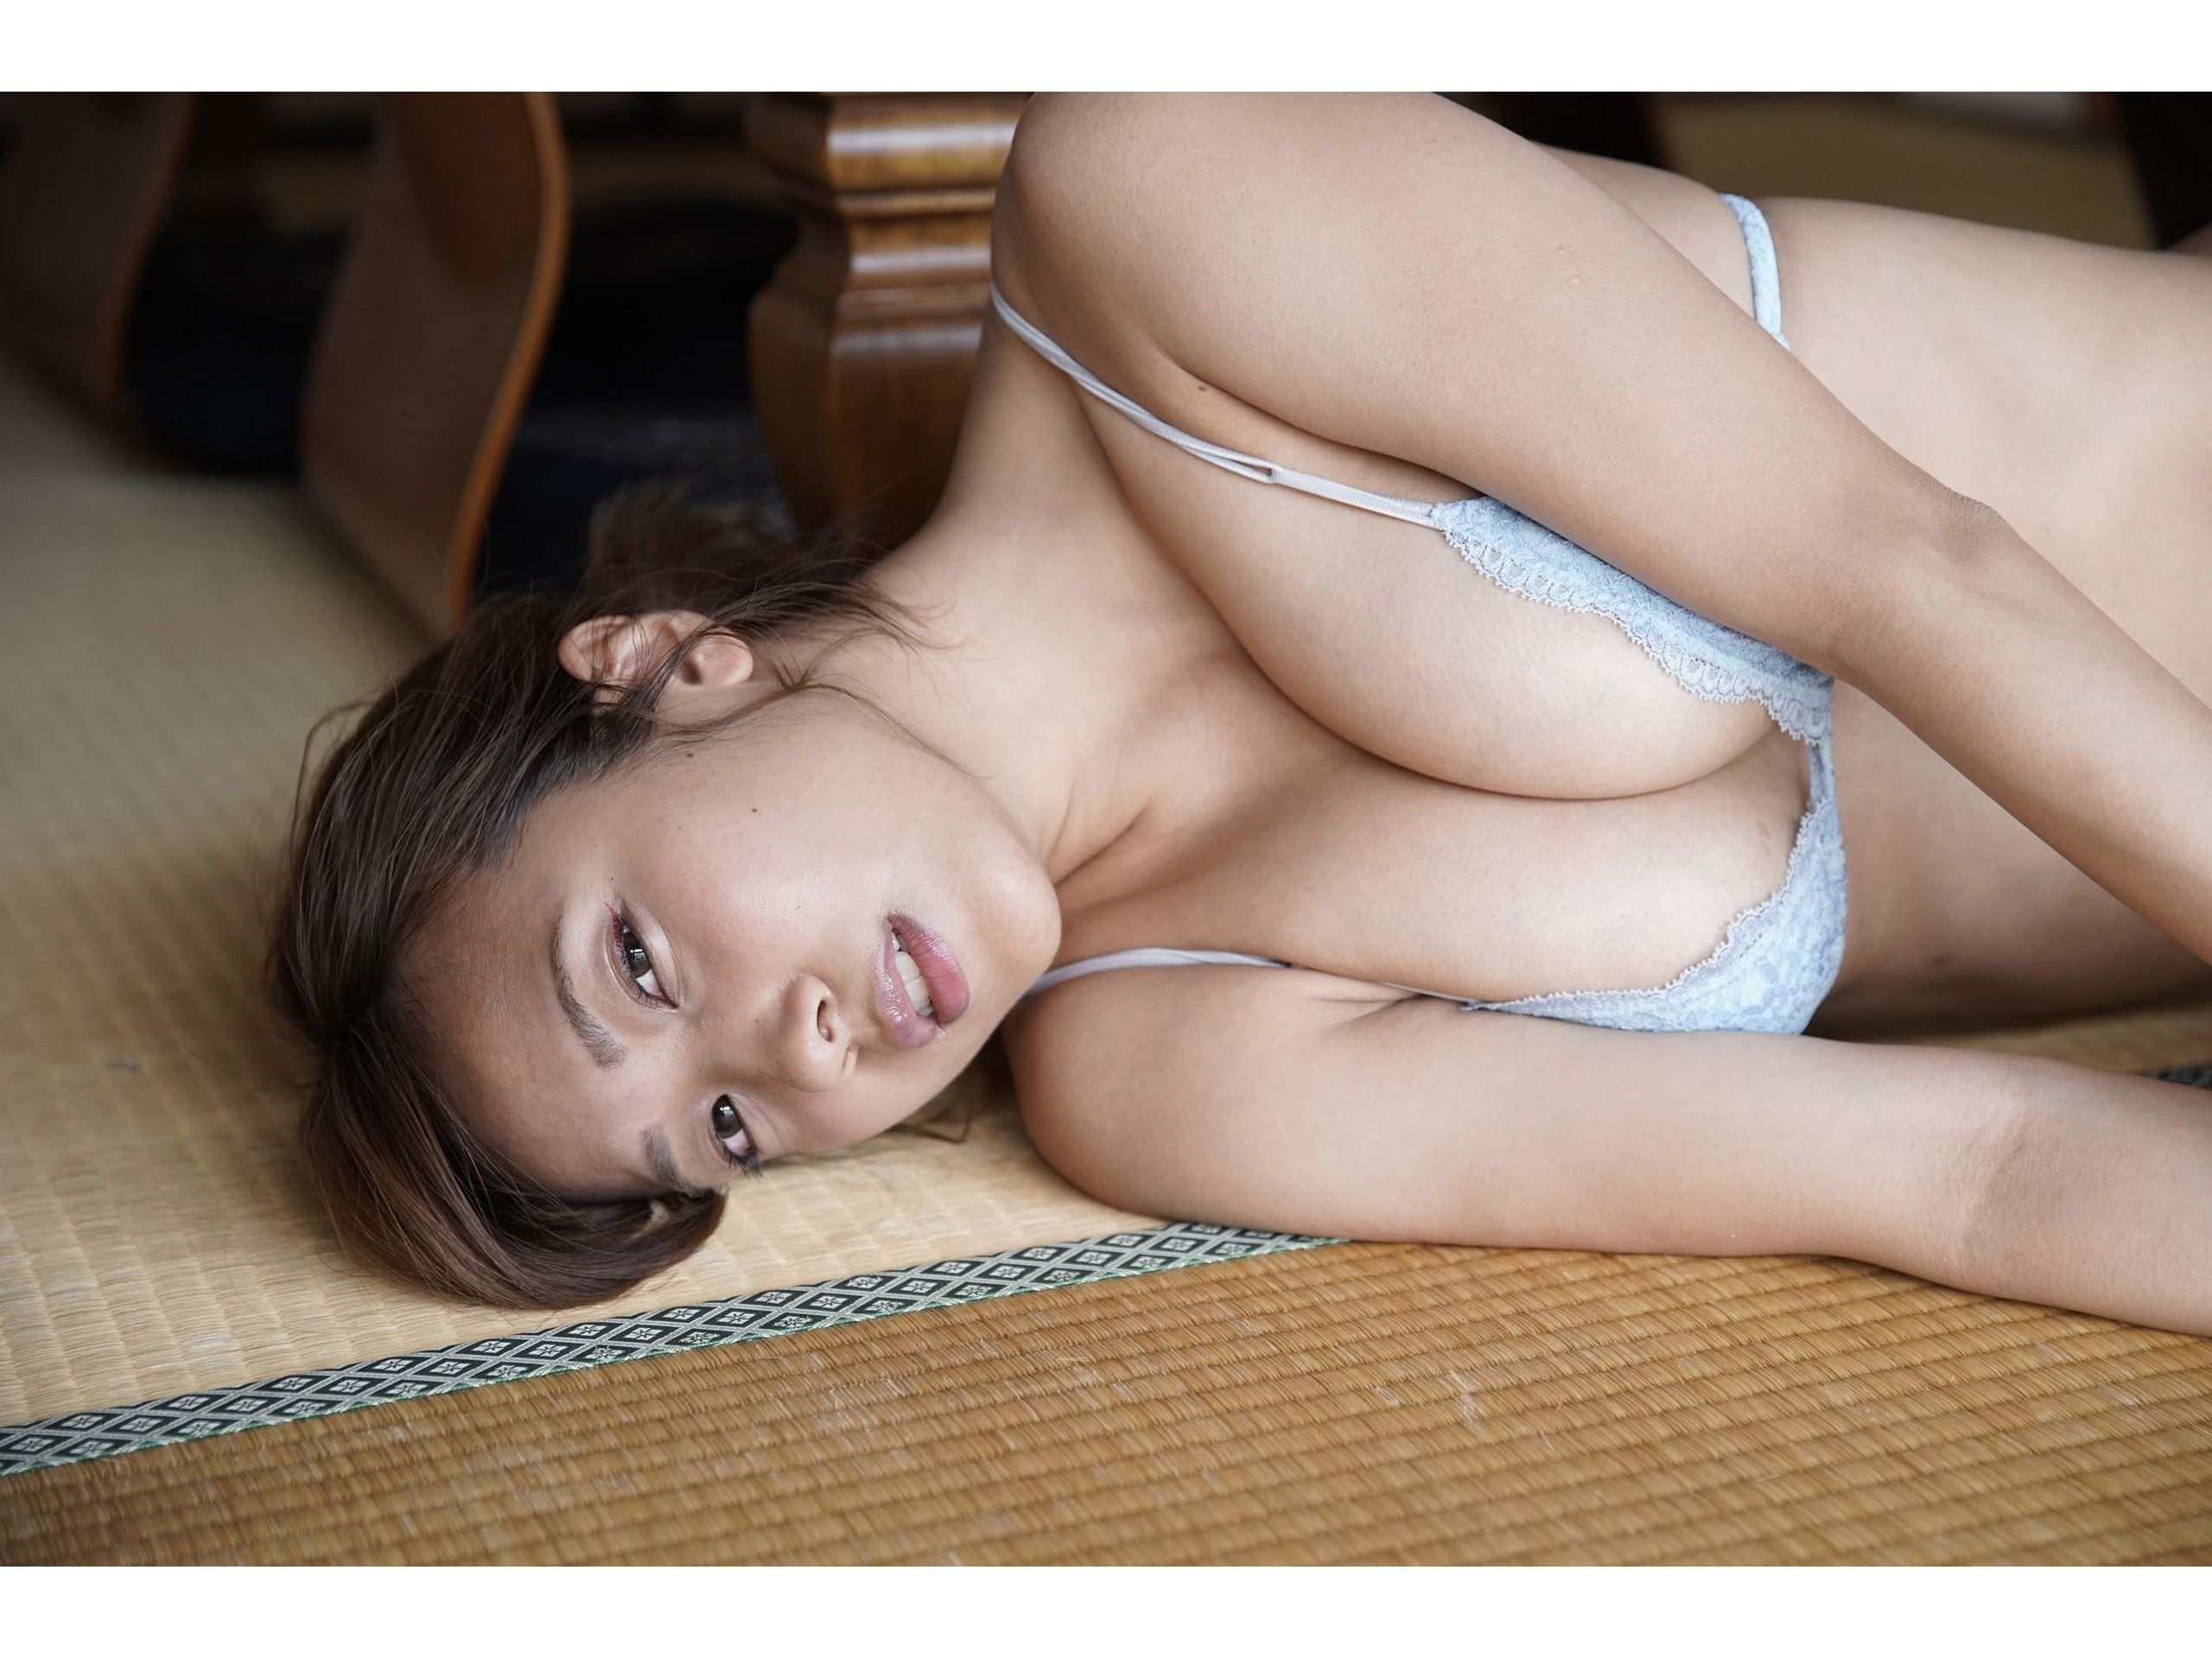 magnetic G 佐藤聖羅『wet』 78photos